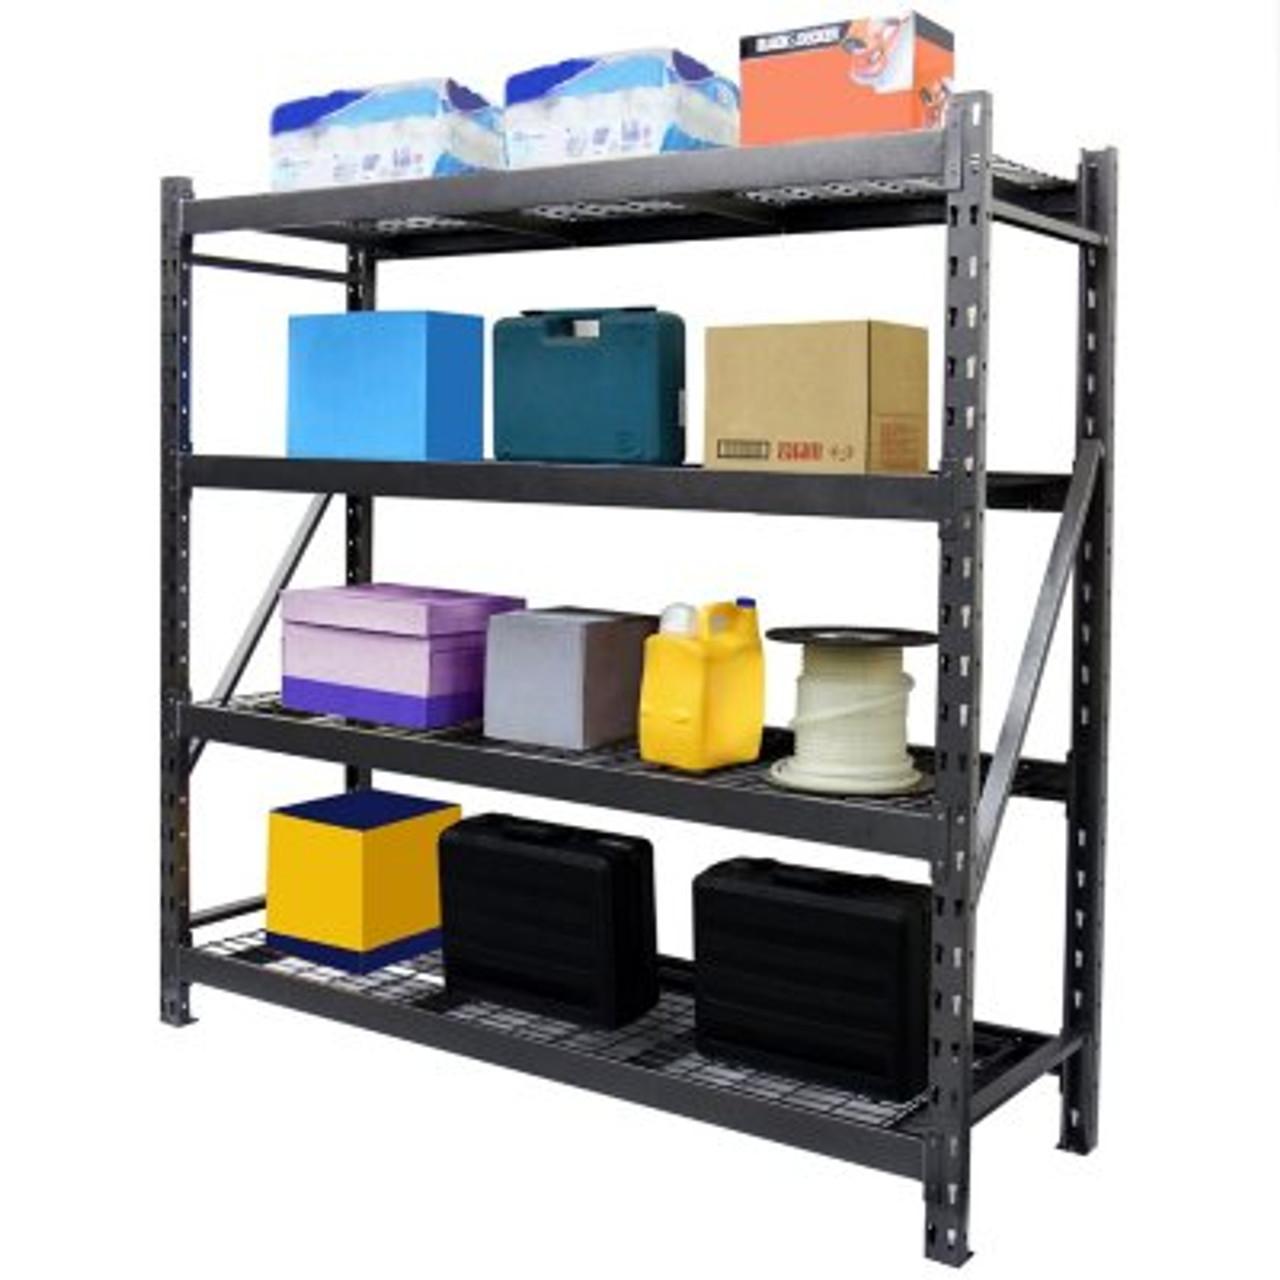 Member's Mark 4-Shelf Industrial Storage Rack